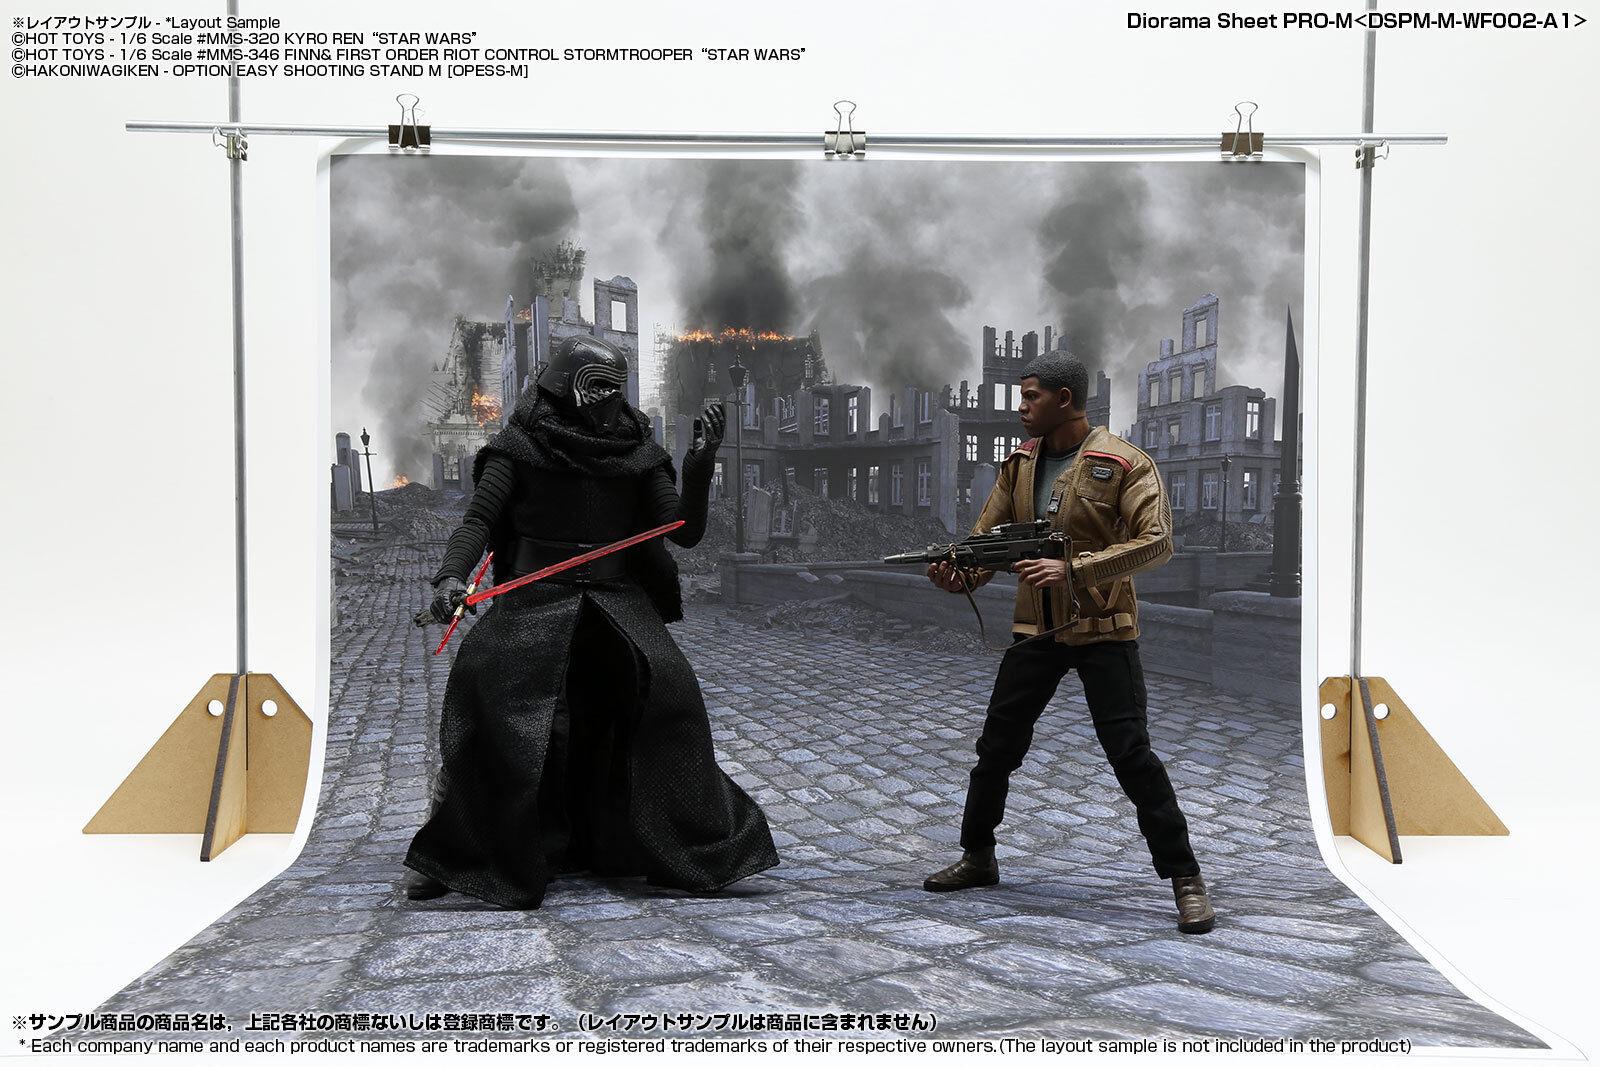 [HAKONIWAGIKEN] Diorama Sheet PRO-M battlefield A1 600x900mm DSPM-M-WF002-A1